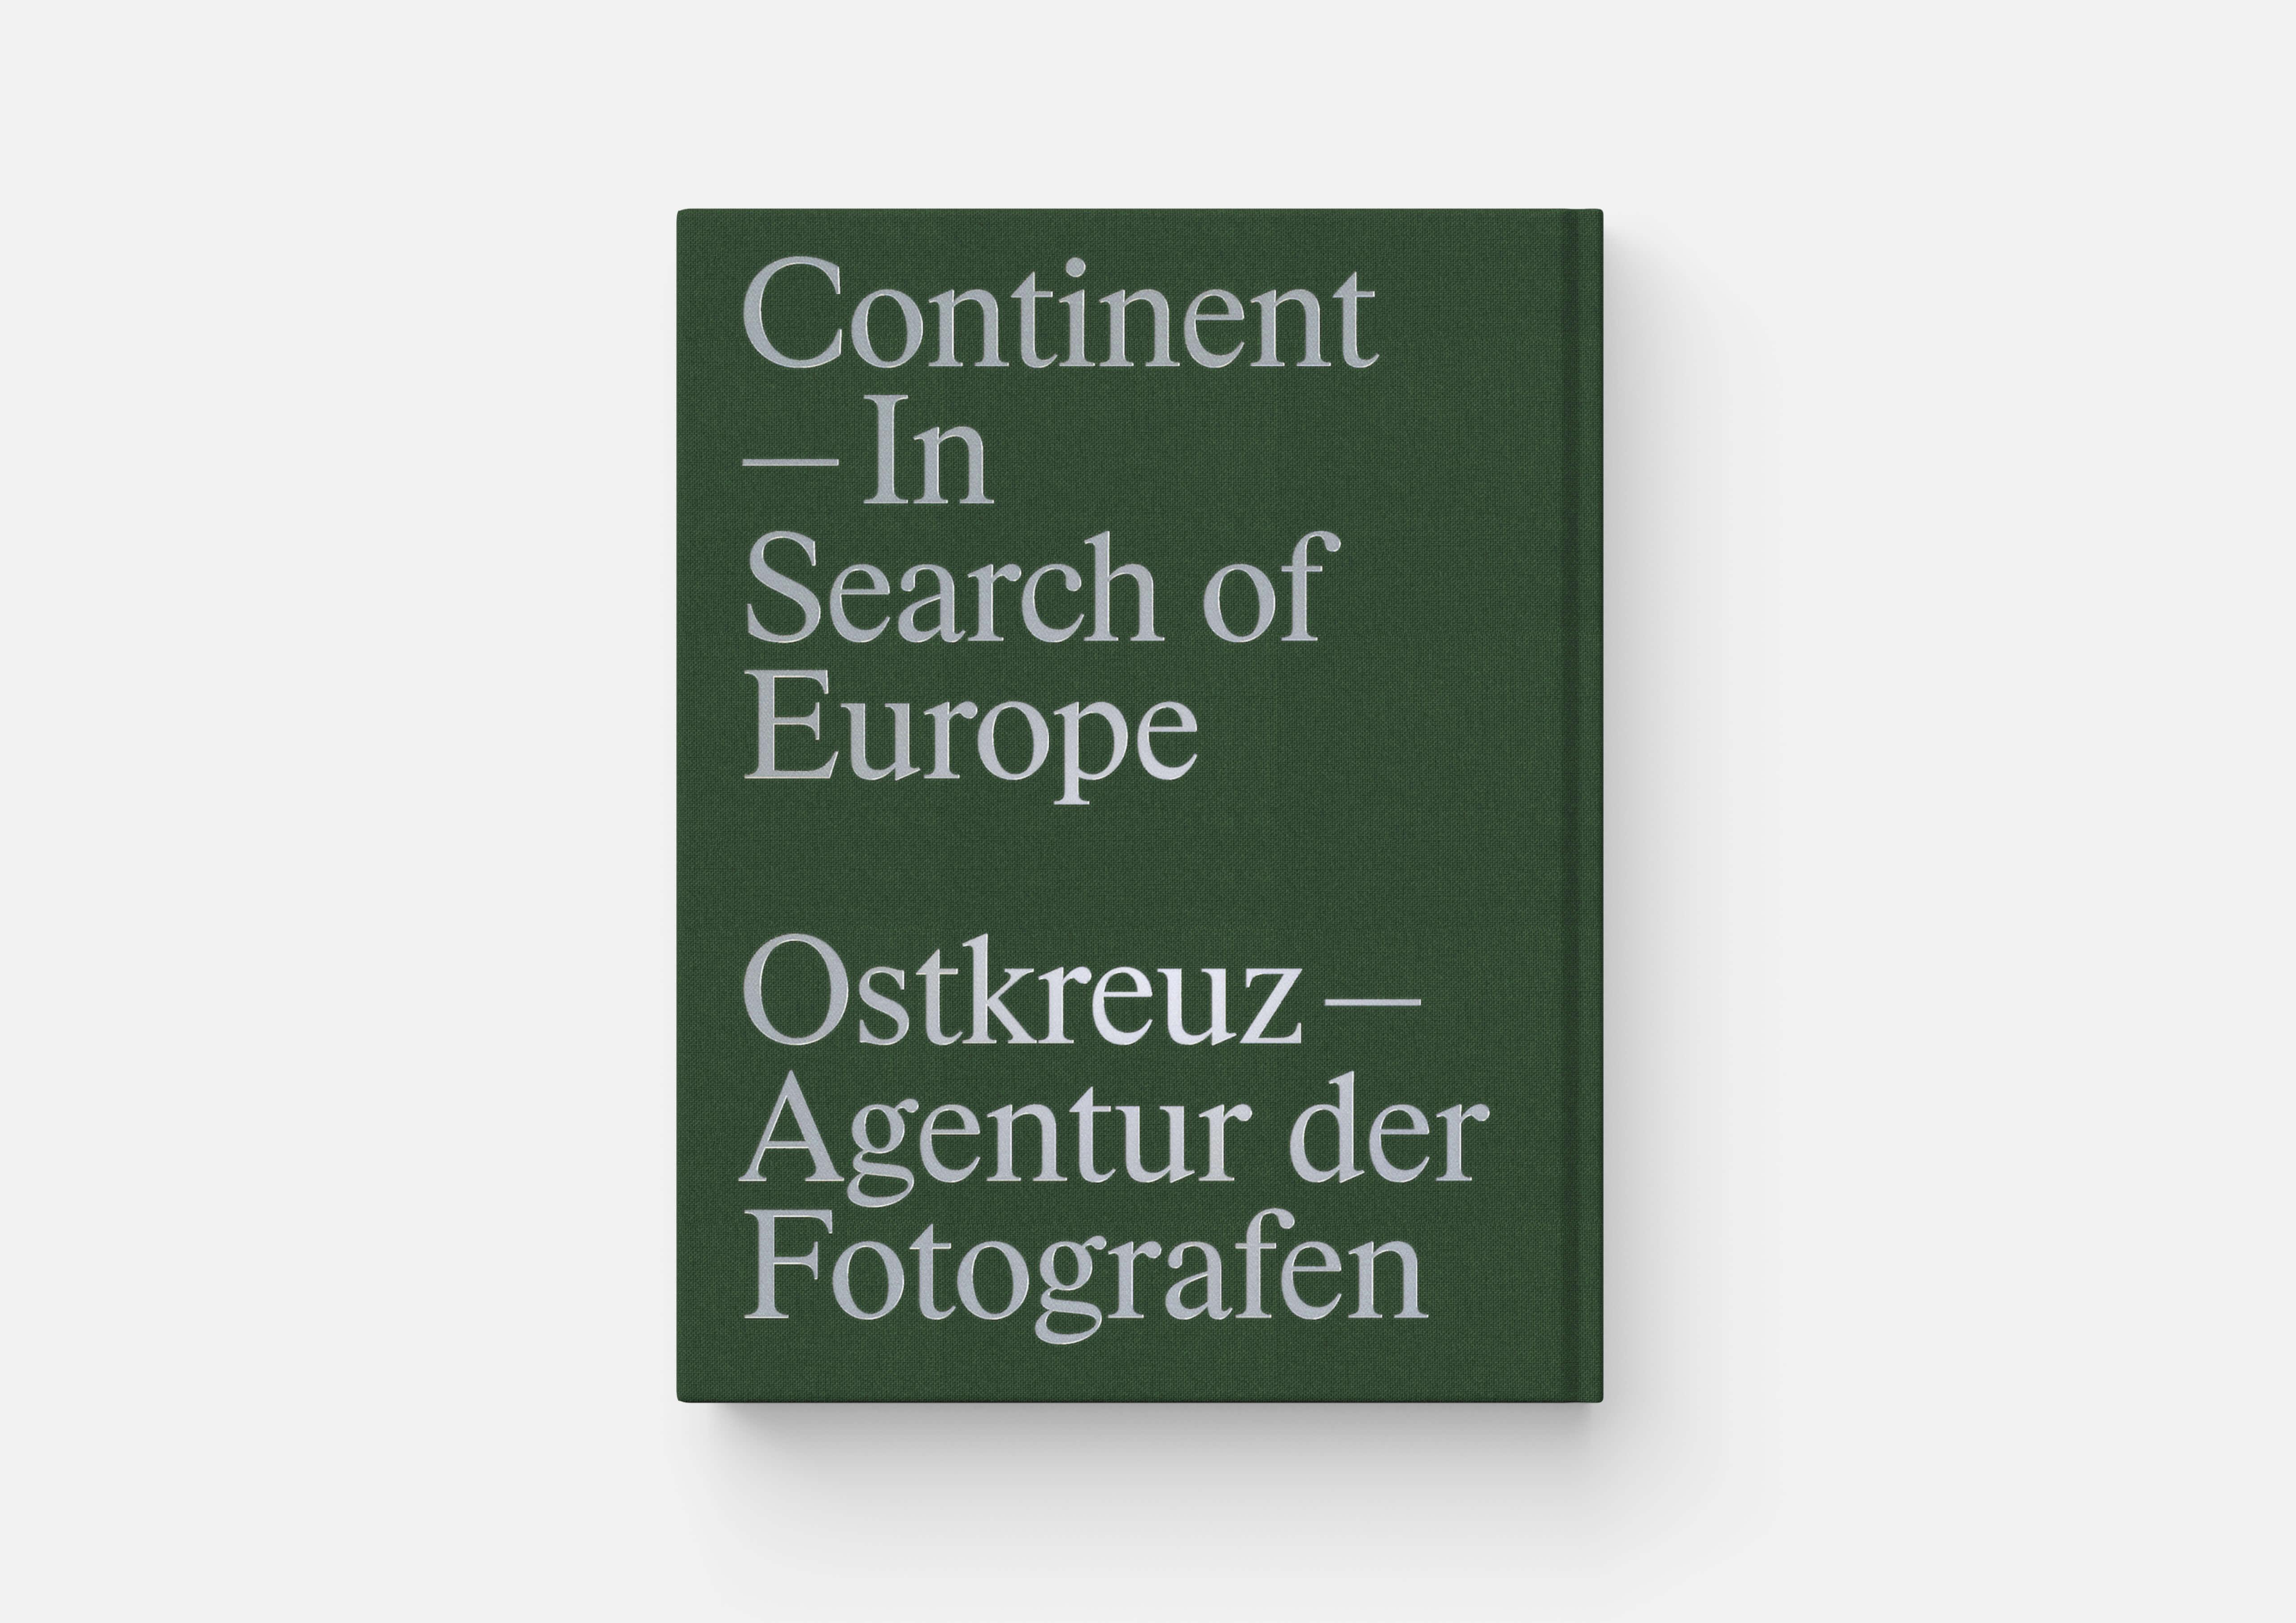 https://neuegestaltung.de/media/pages/clients/ostkreuz-kontinent/c3b561ea0b-1606670610/1_ostkreuz-kont-cover-back.jpg